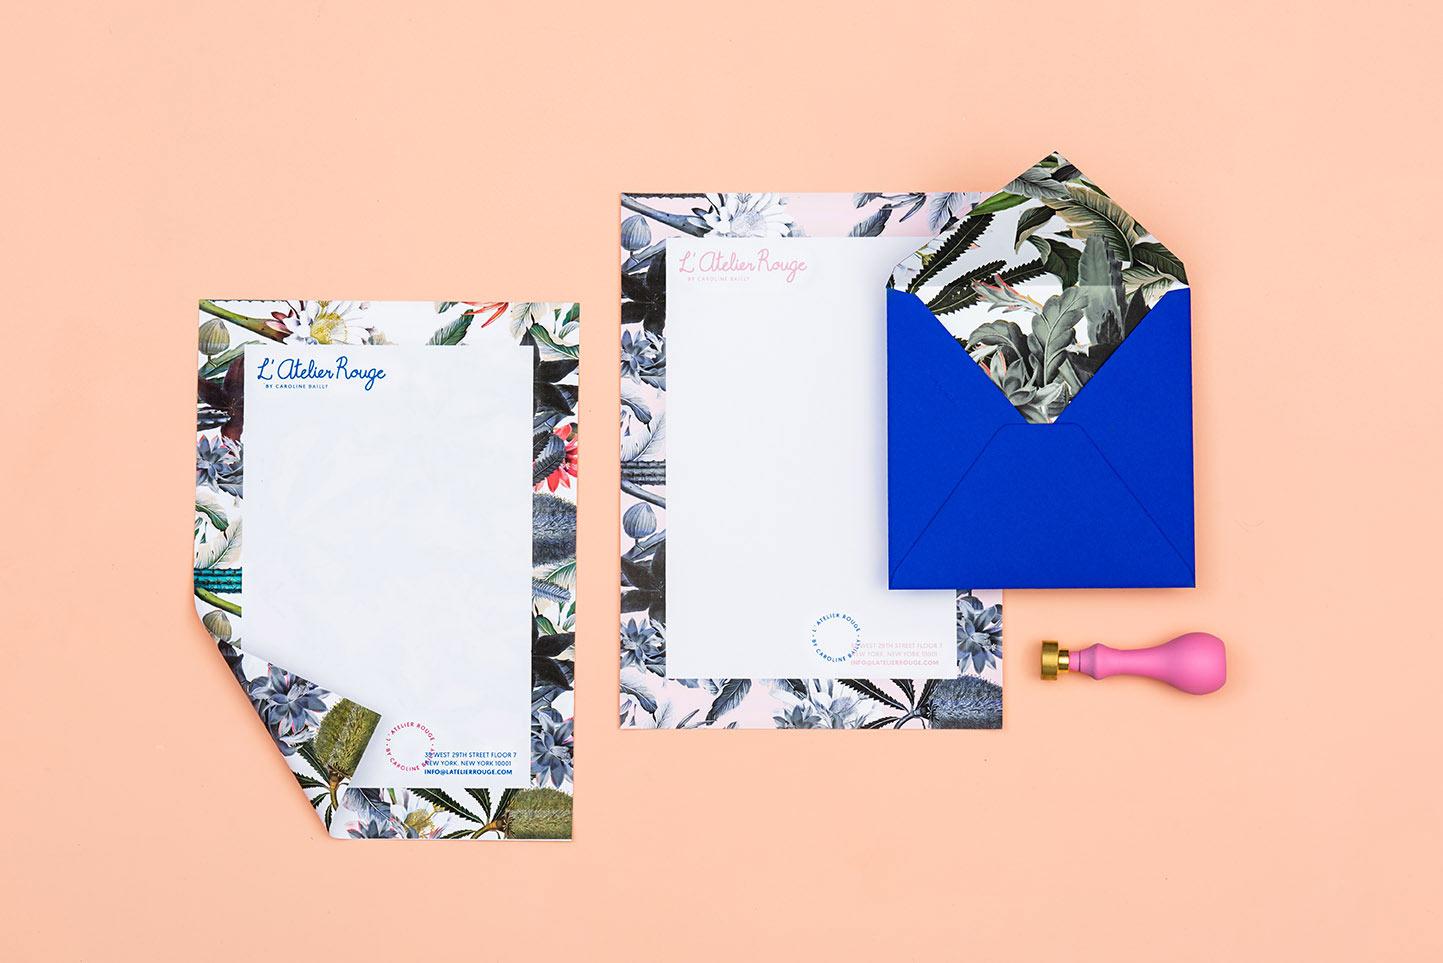 L'Atelier Rouge identity design